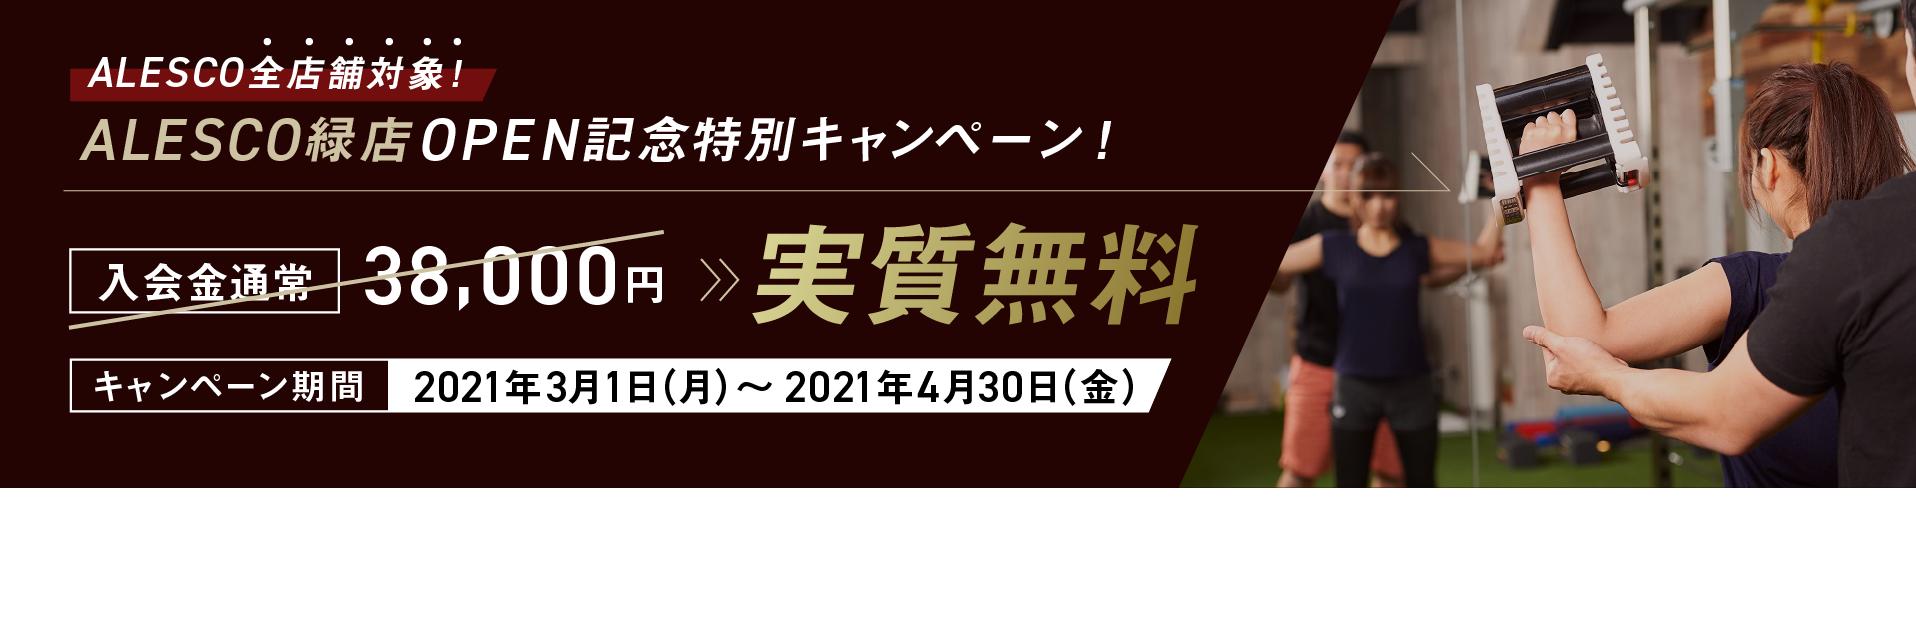 ALESCO緑店OPEN記念特別キャンペーン!